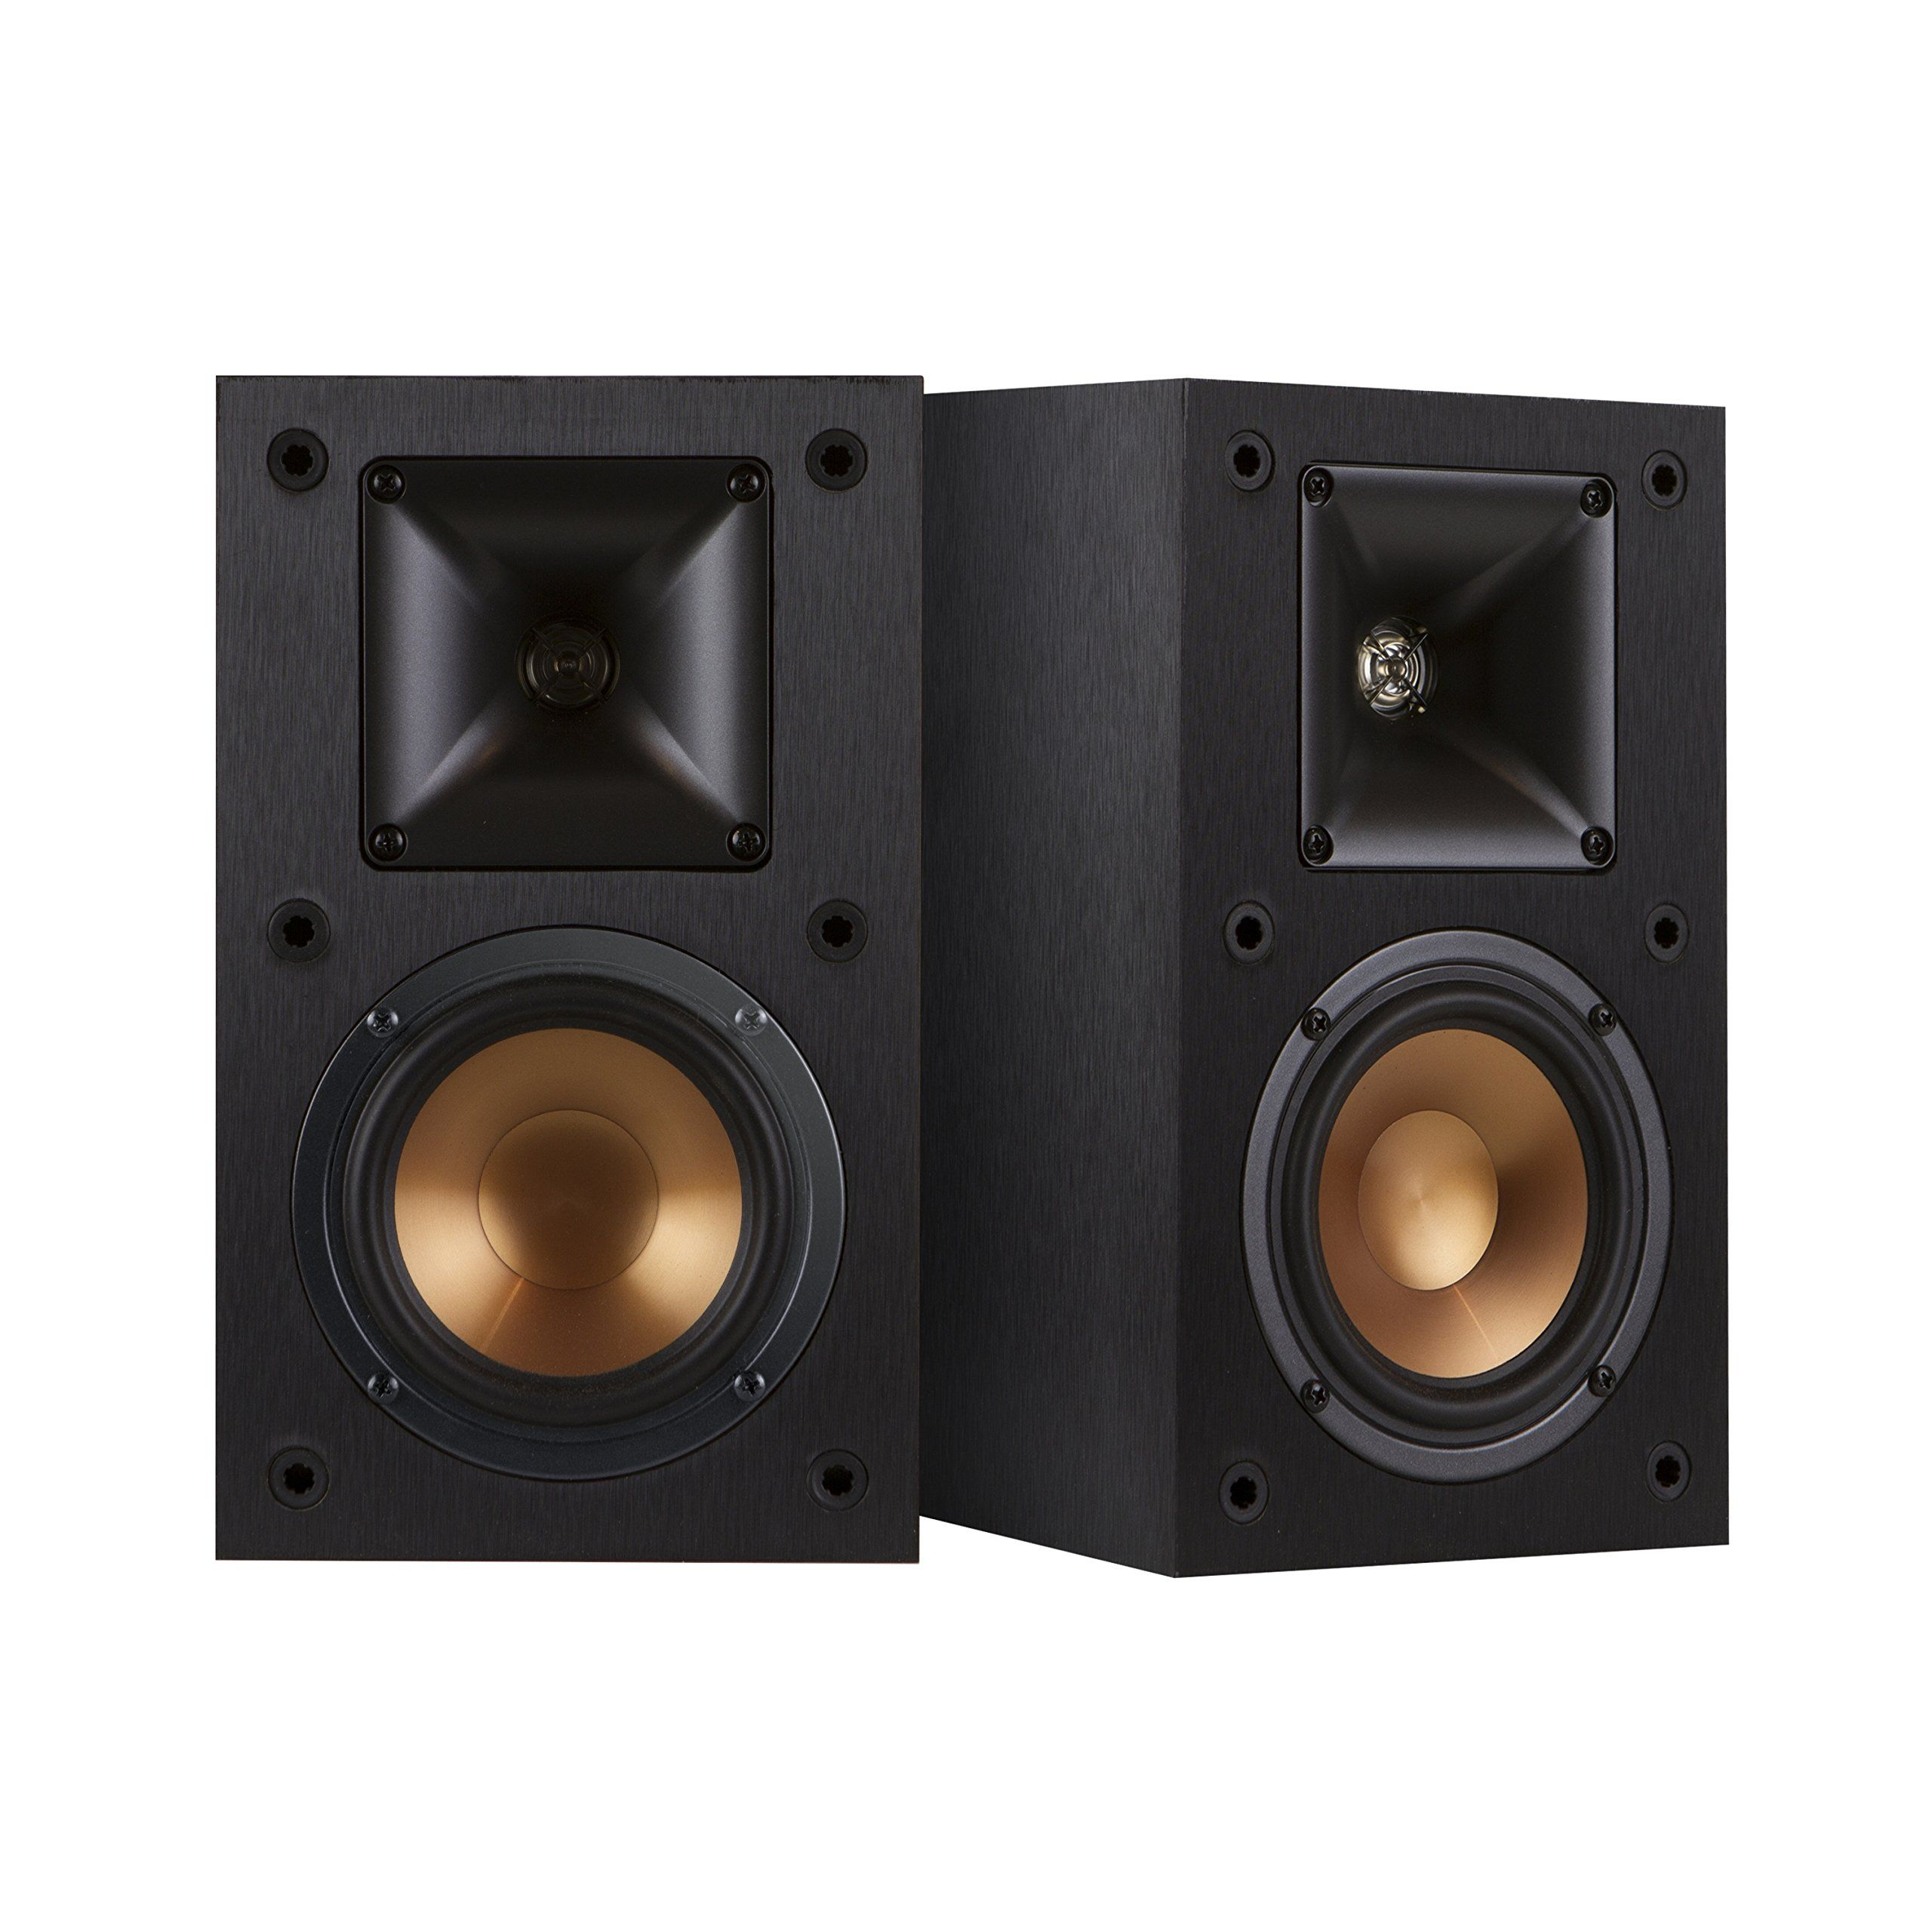 klipsch r-14m 4-inch reference bookshelf speakers (pair, black